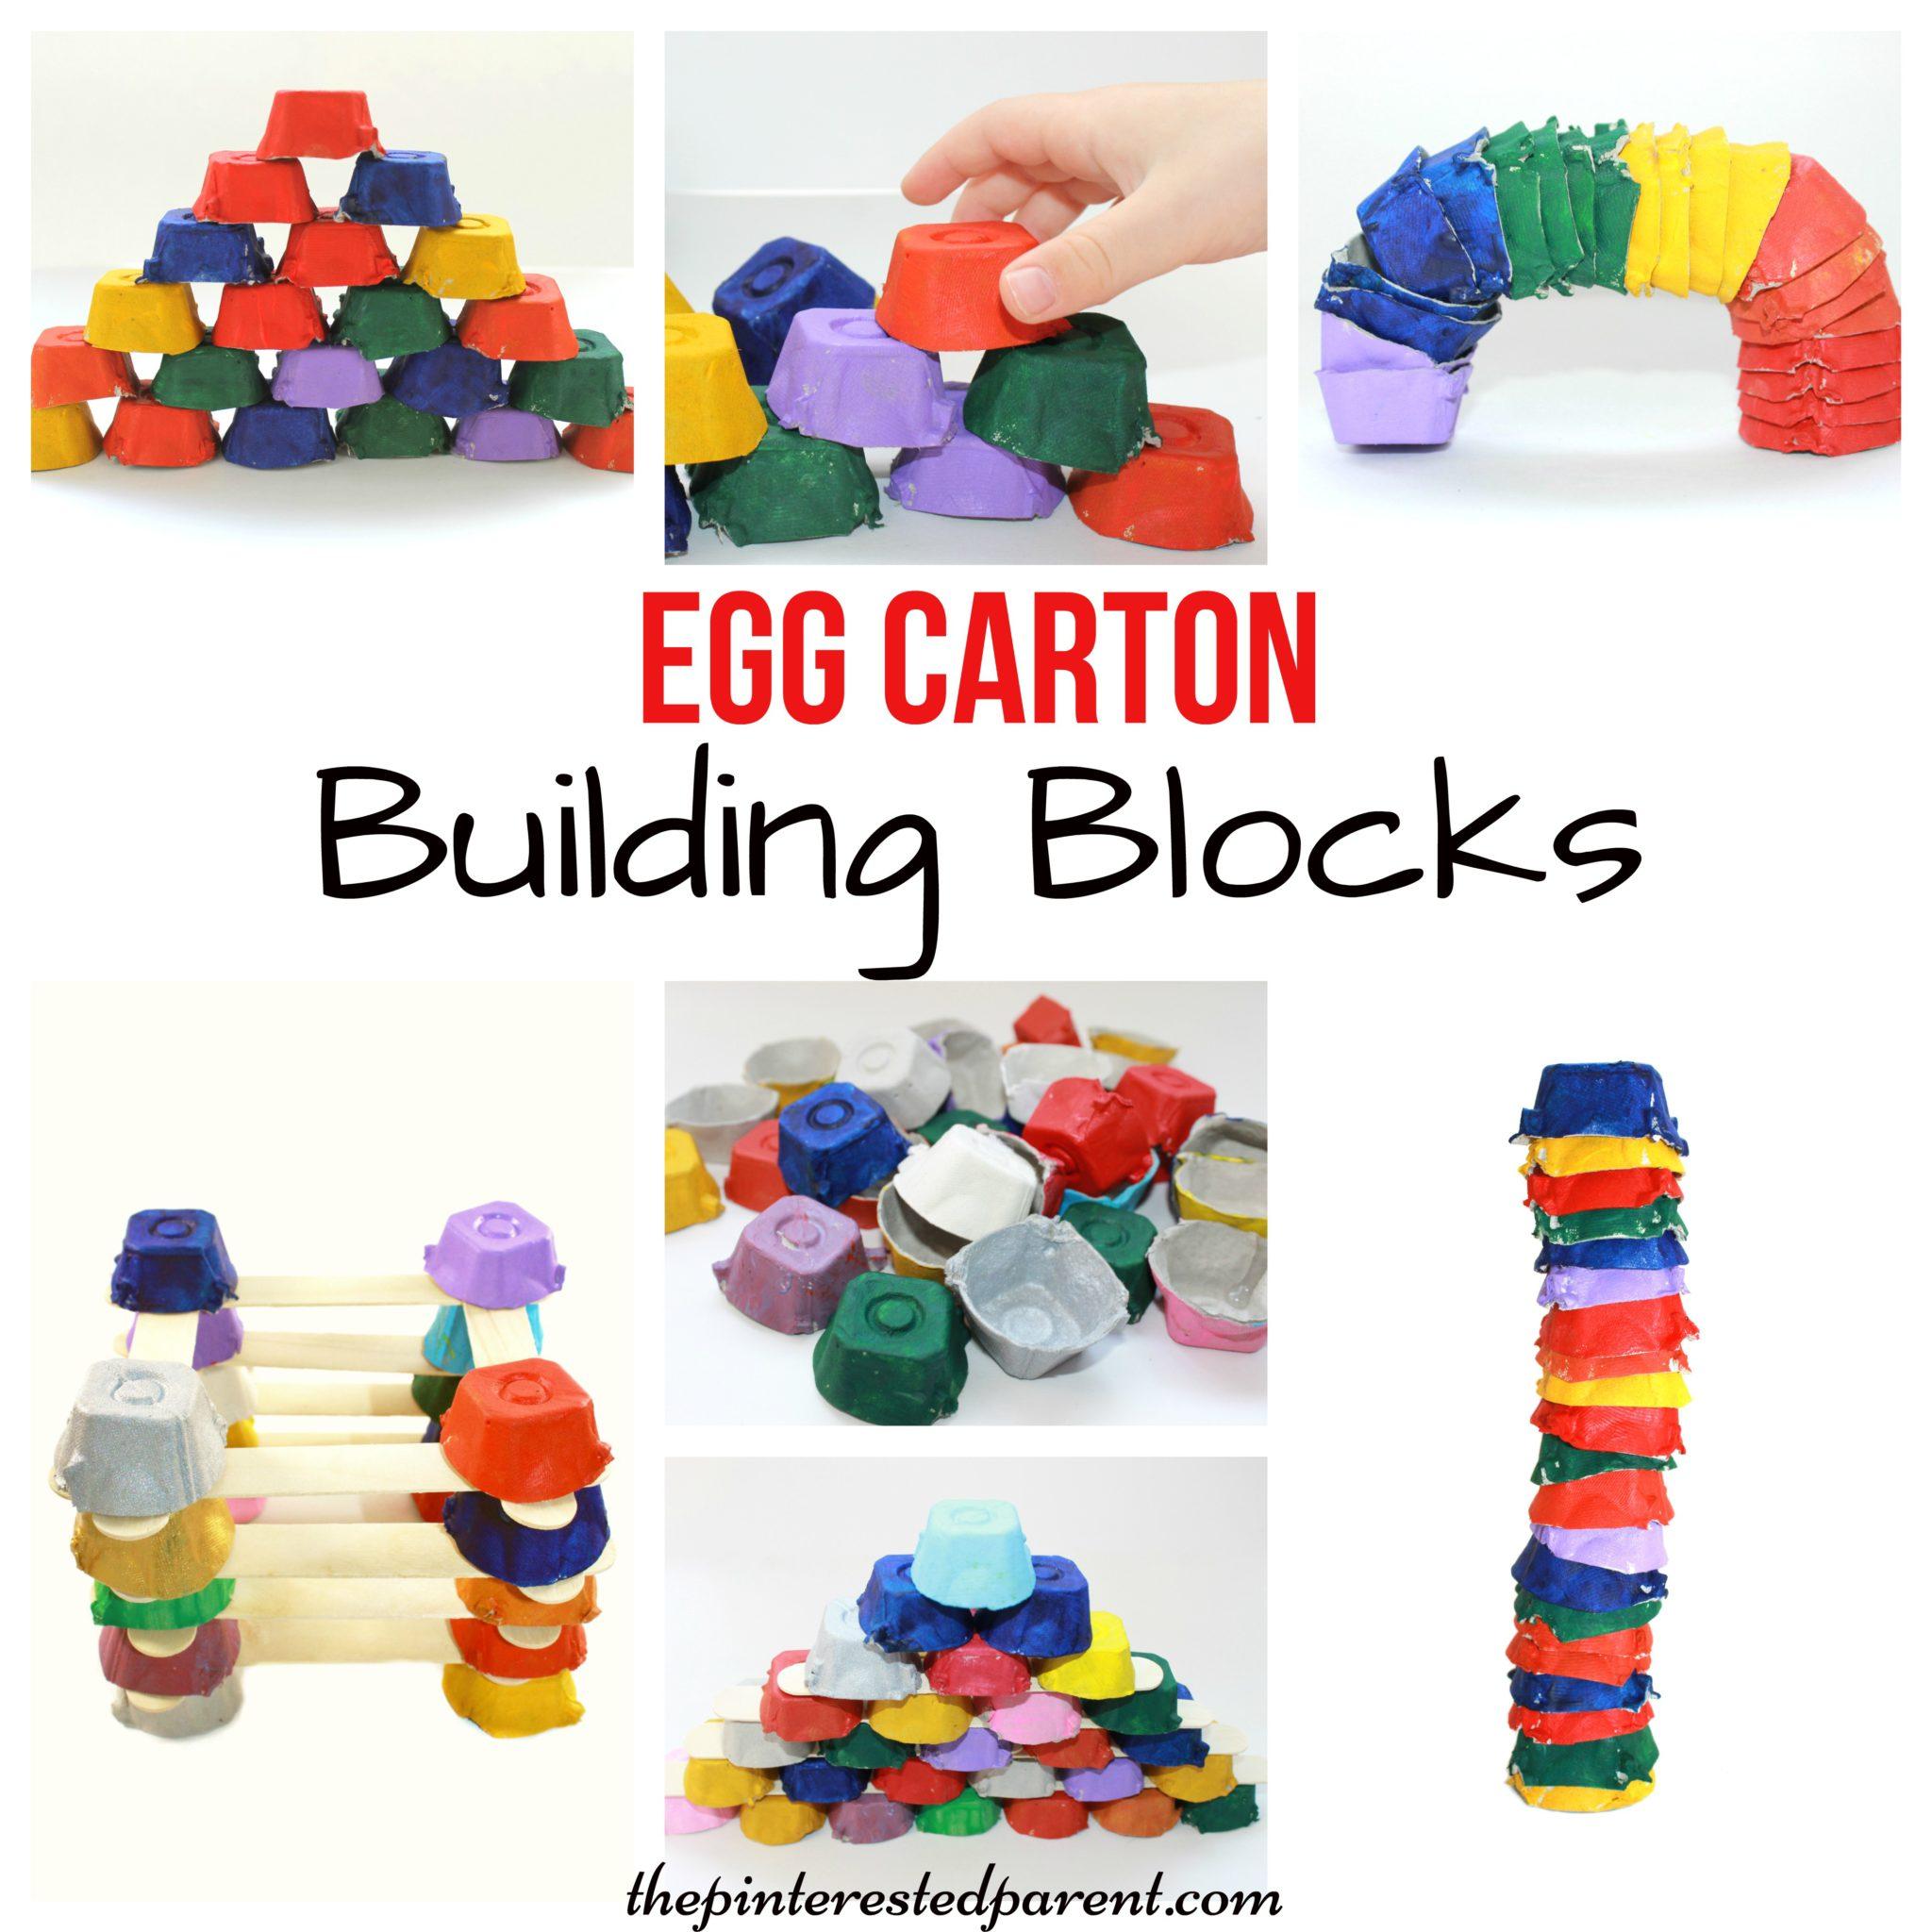 Egg Carton Building Blocks – The Pinterested Parent